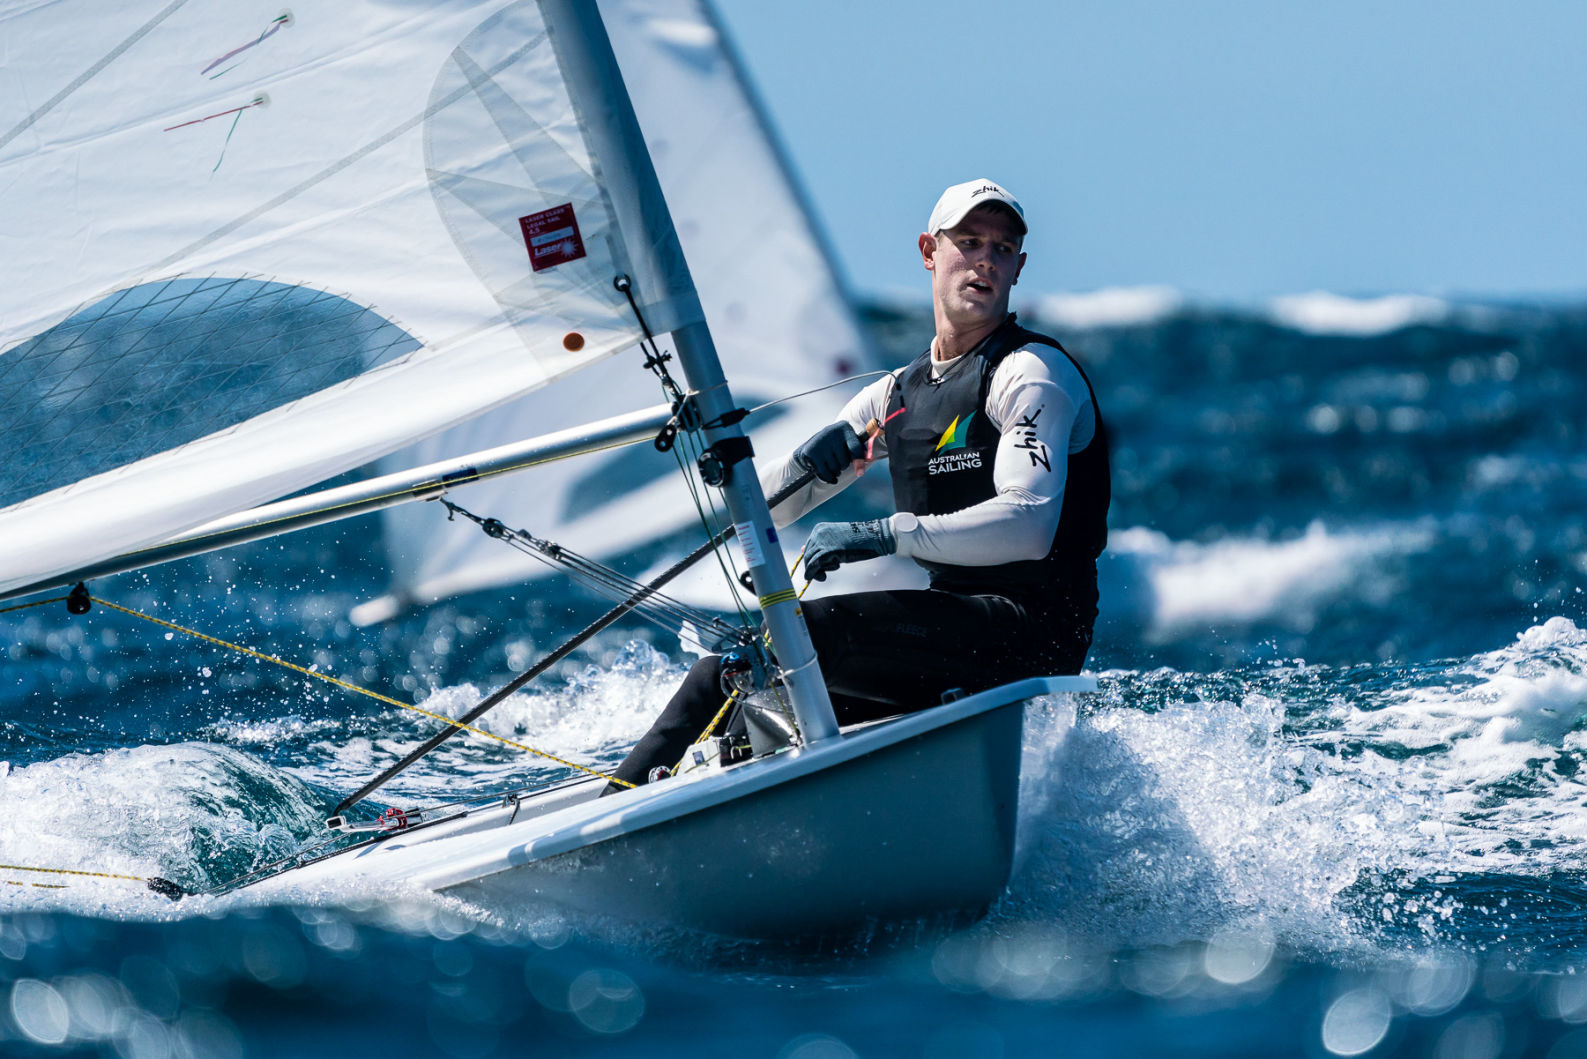 Matt Wearn sailing his laser